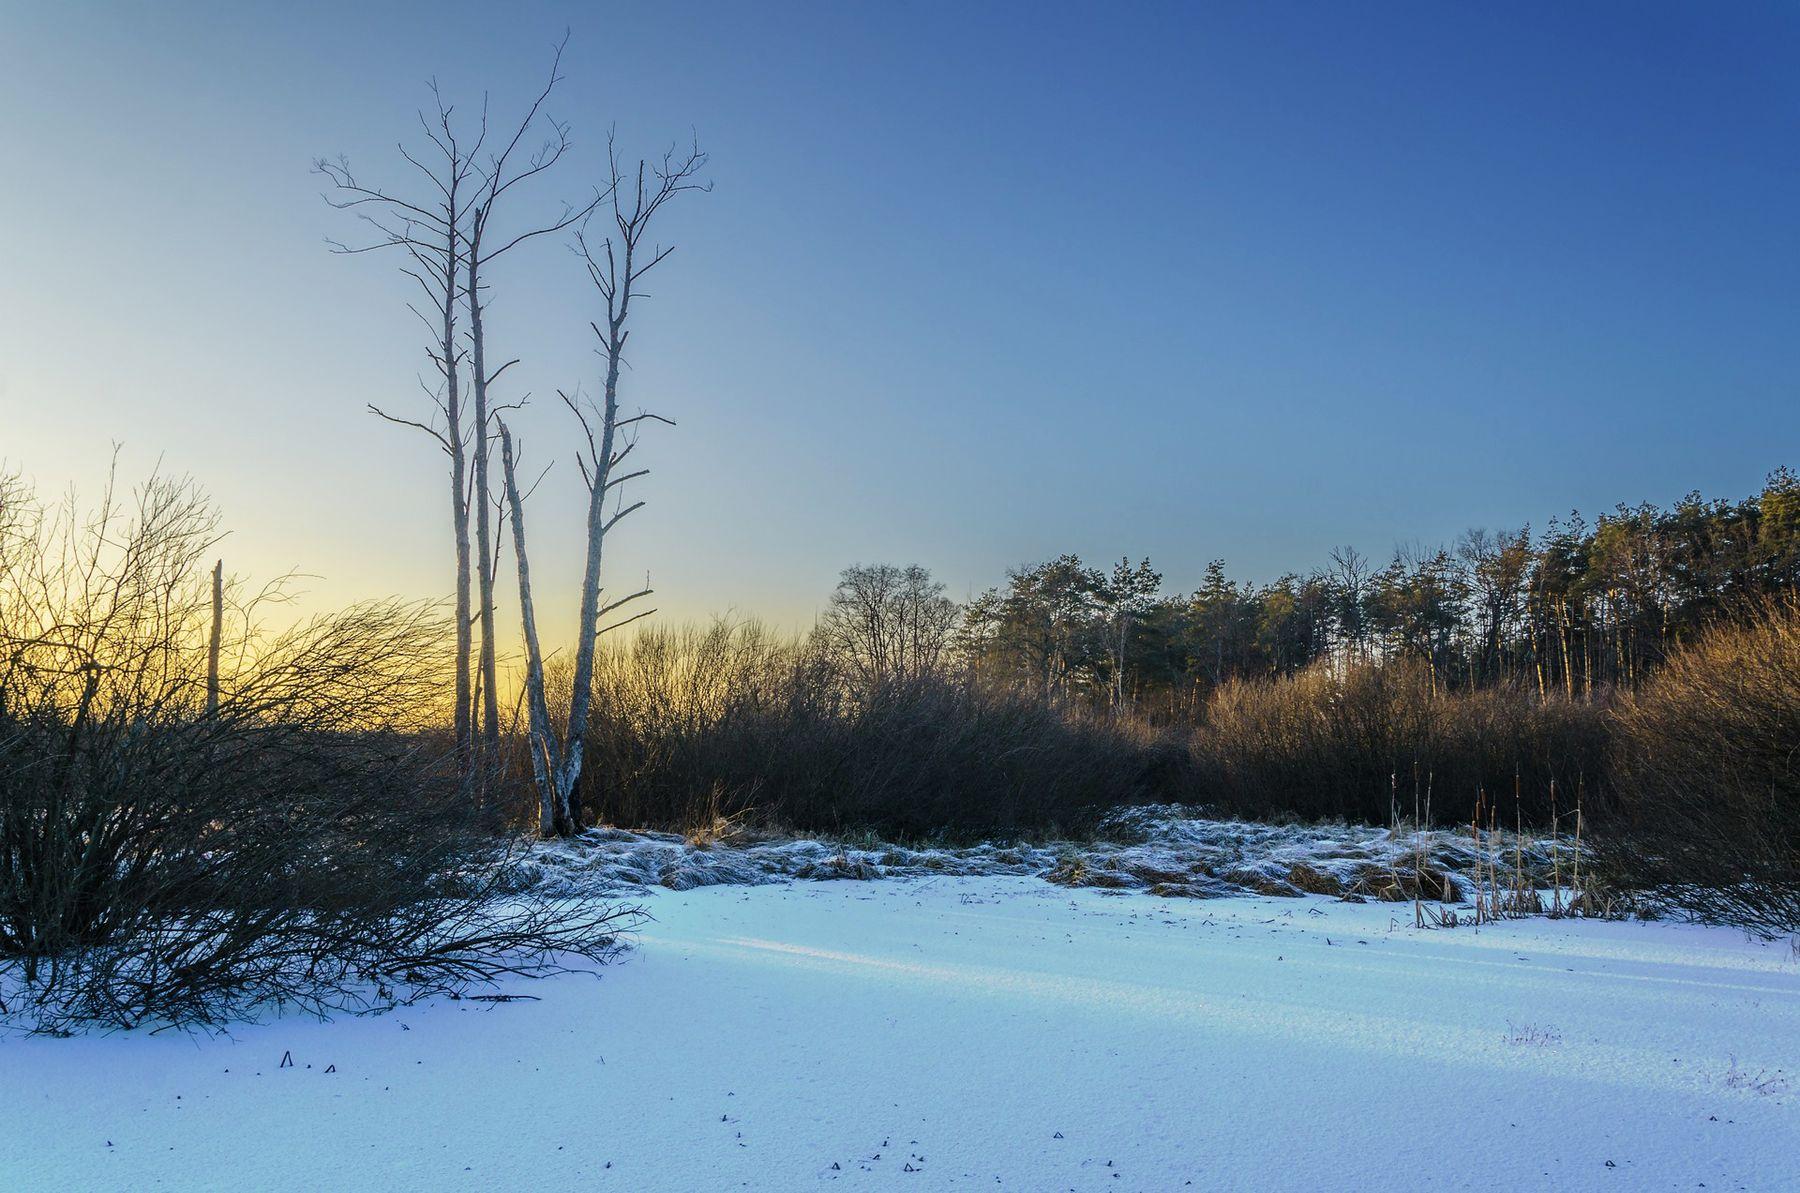 Морозный закат зима мороз закат болото старица пейзаж природа